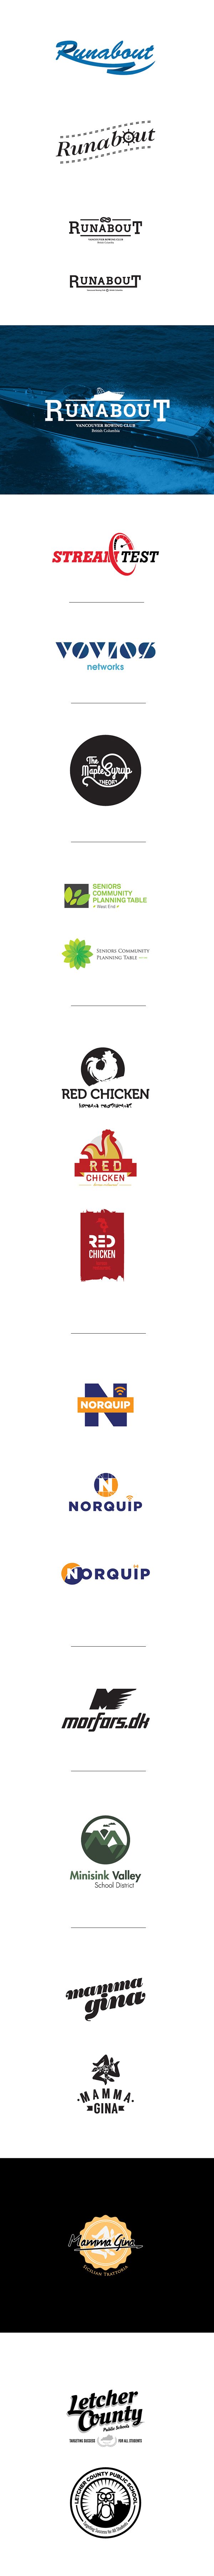 identity design graphic brand Logotype logo boat Food  restaurant Web corporate font pictogram